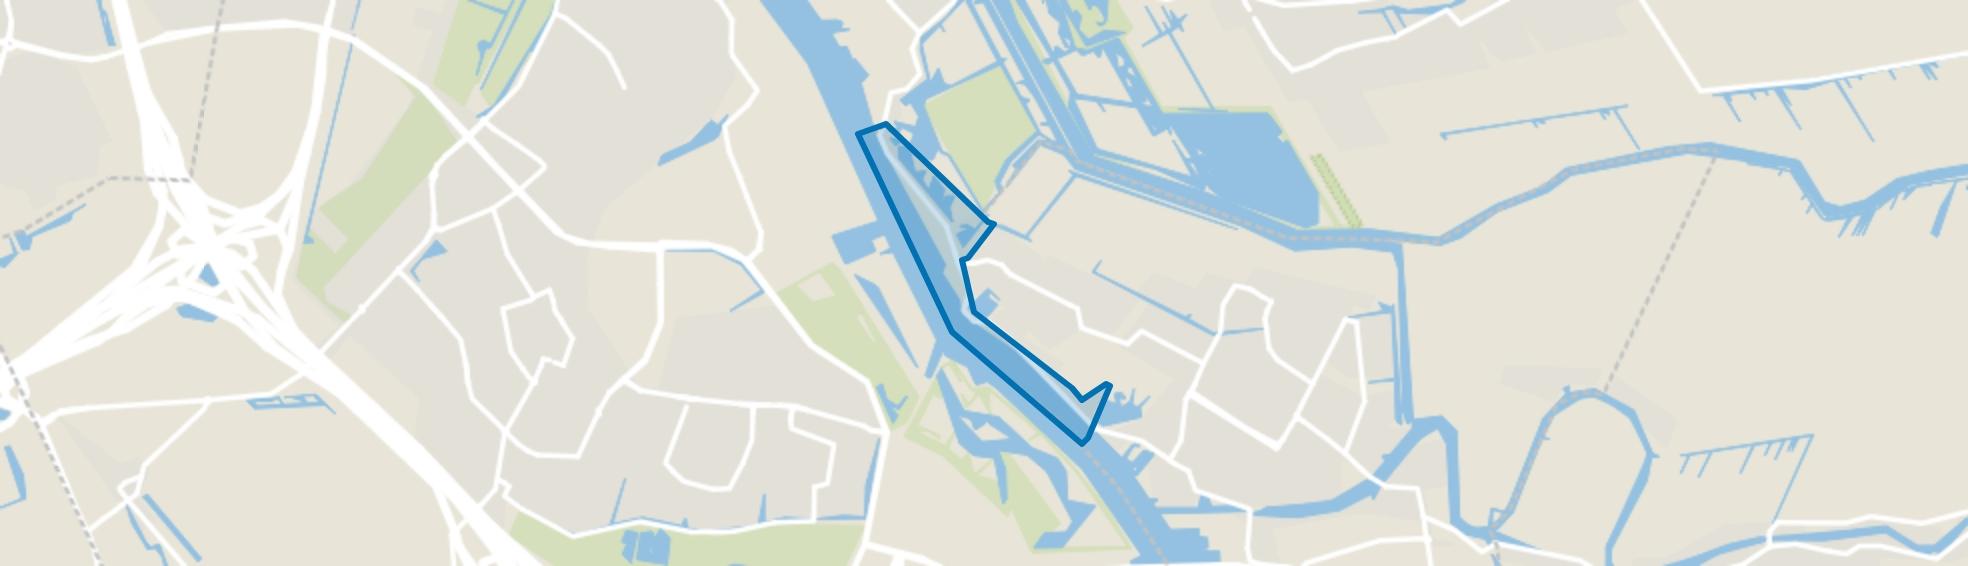 Dijk, Alblasserdam map